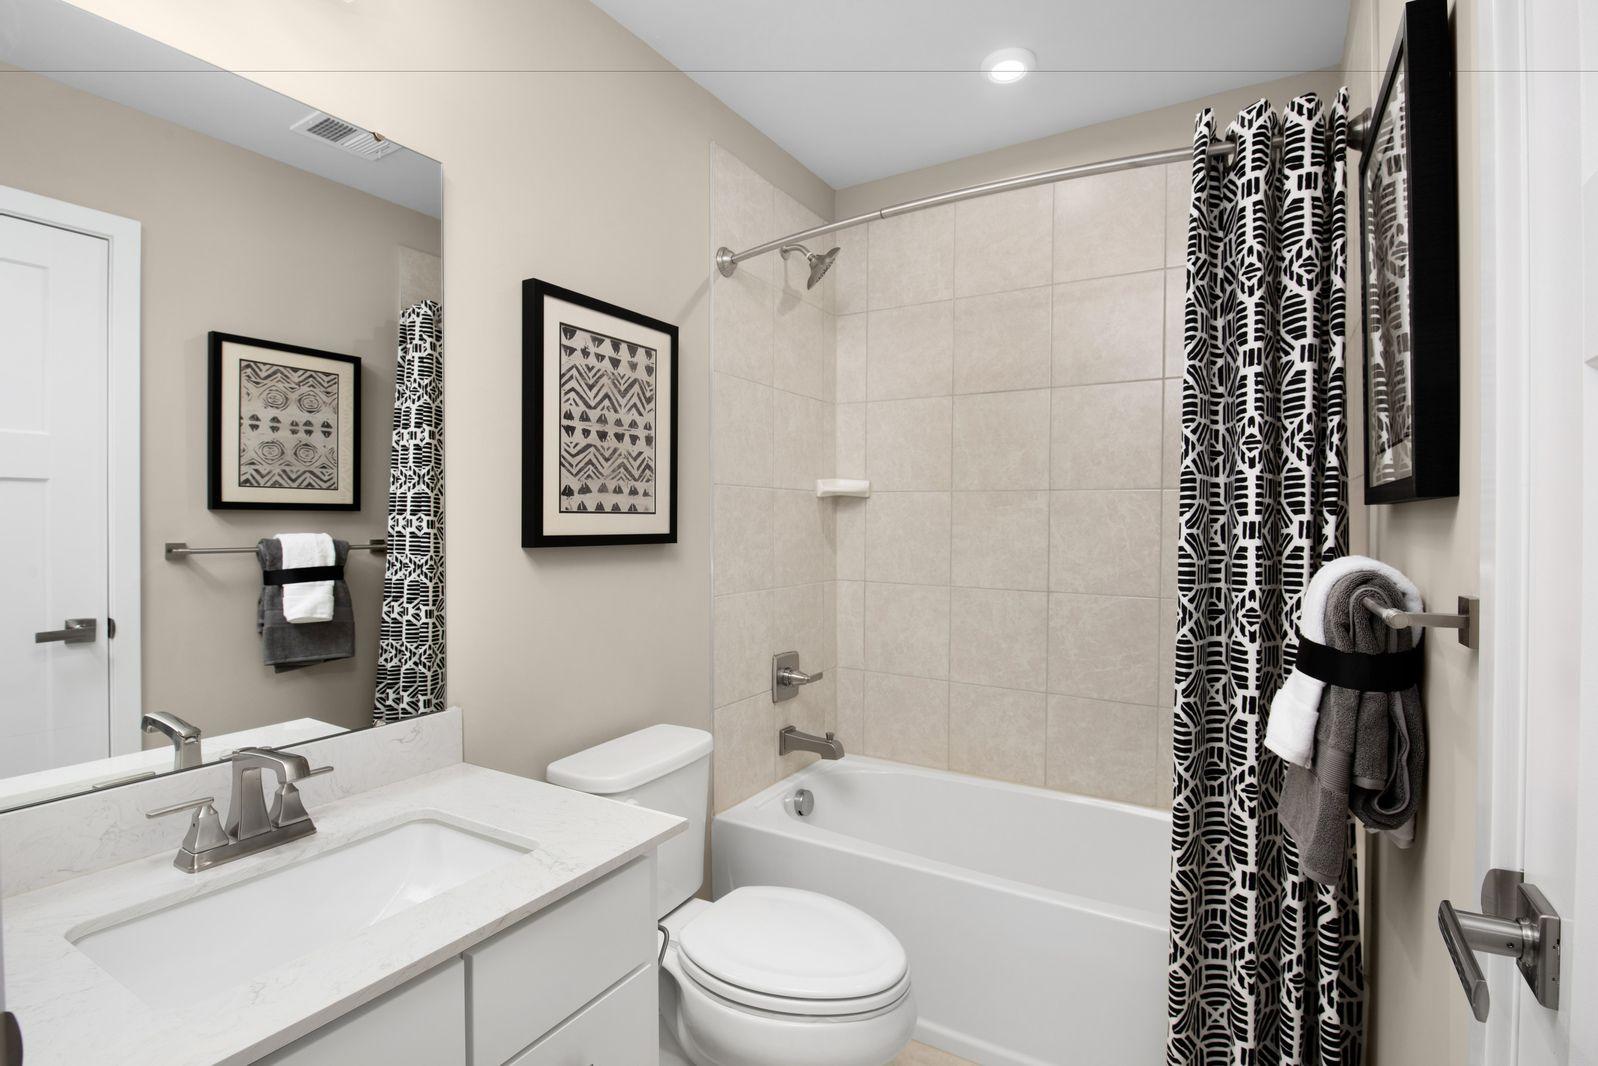 Bathroom featured in the Mendelssohn with 1-Car Garage By Ryan Homes in Philadelphia, NJ